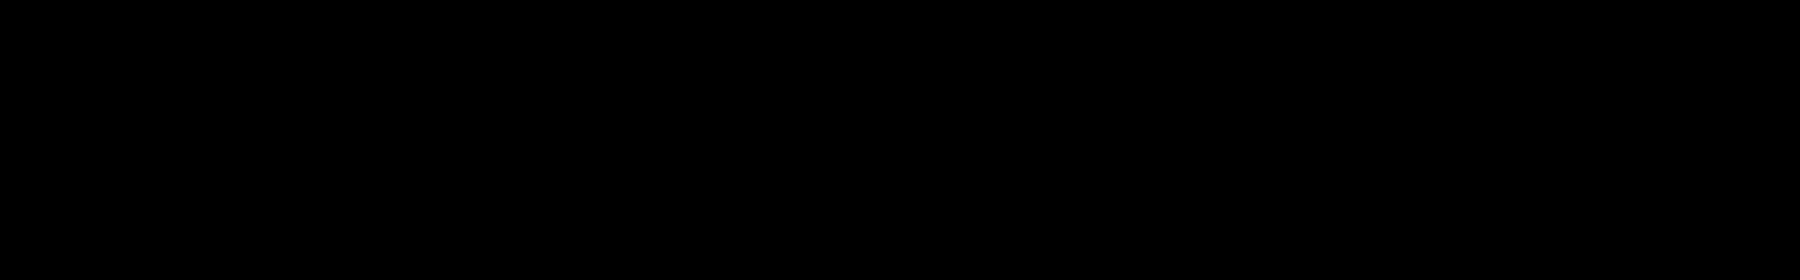 Bart Skils Style Ableton Live Template audio waveform